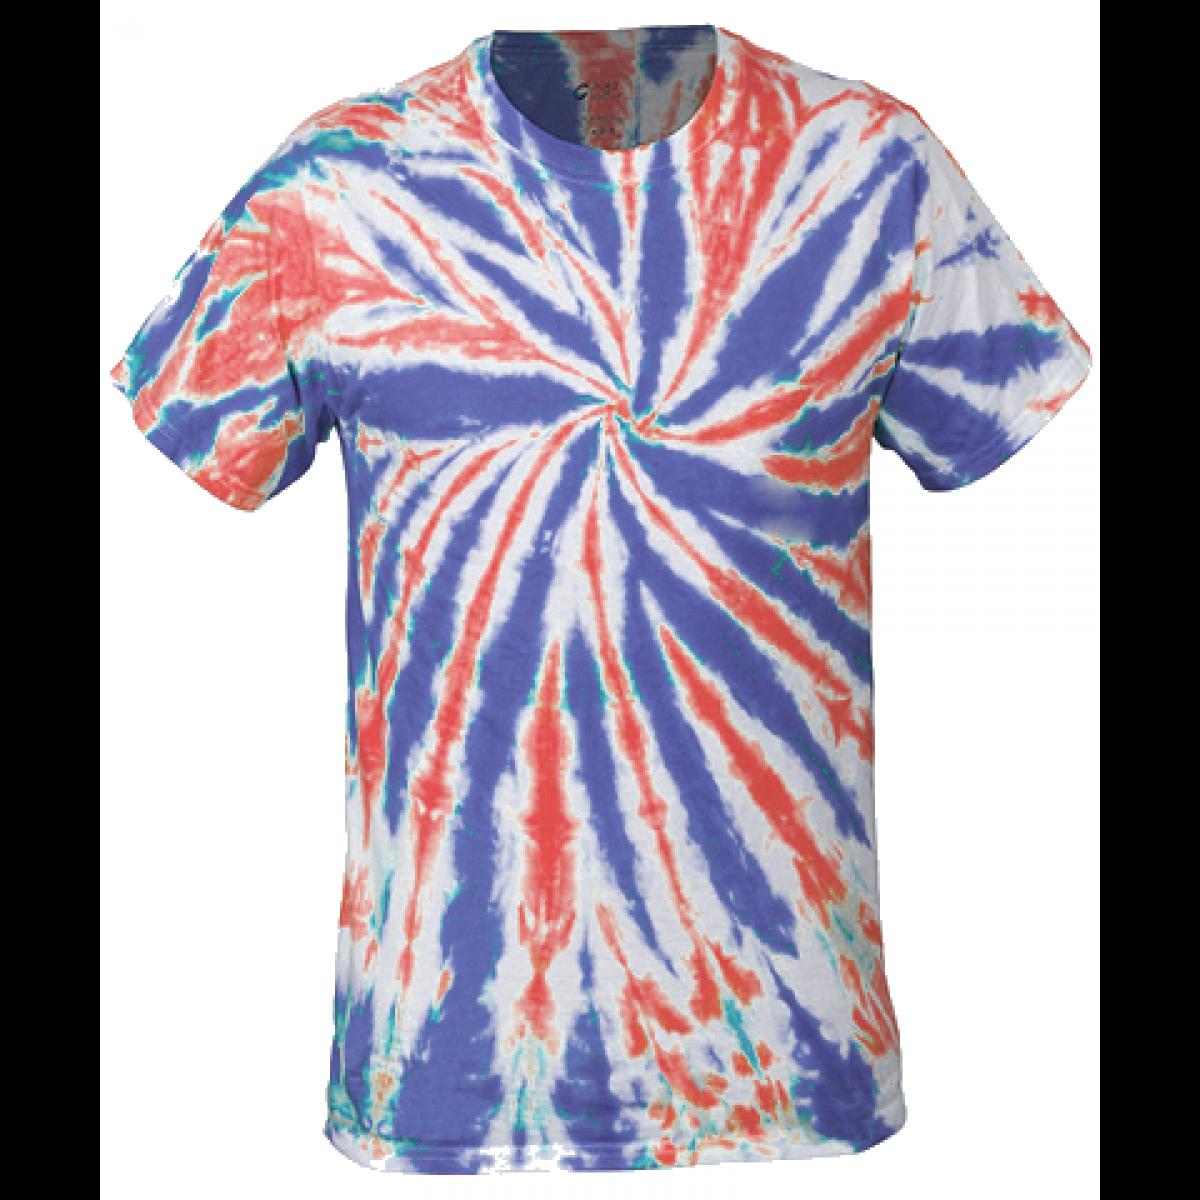 Multi-Color Tie-Dye Tee -Red/White/Blue-YM